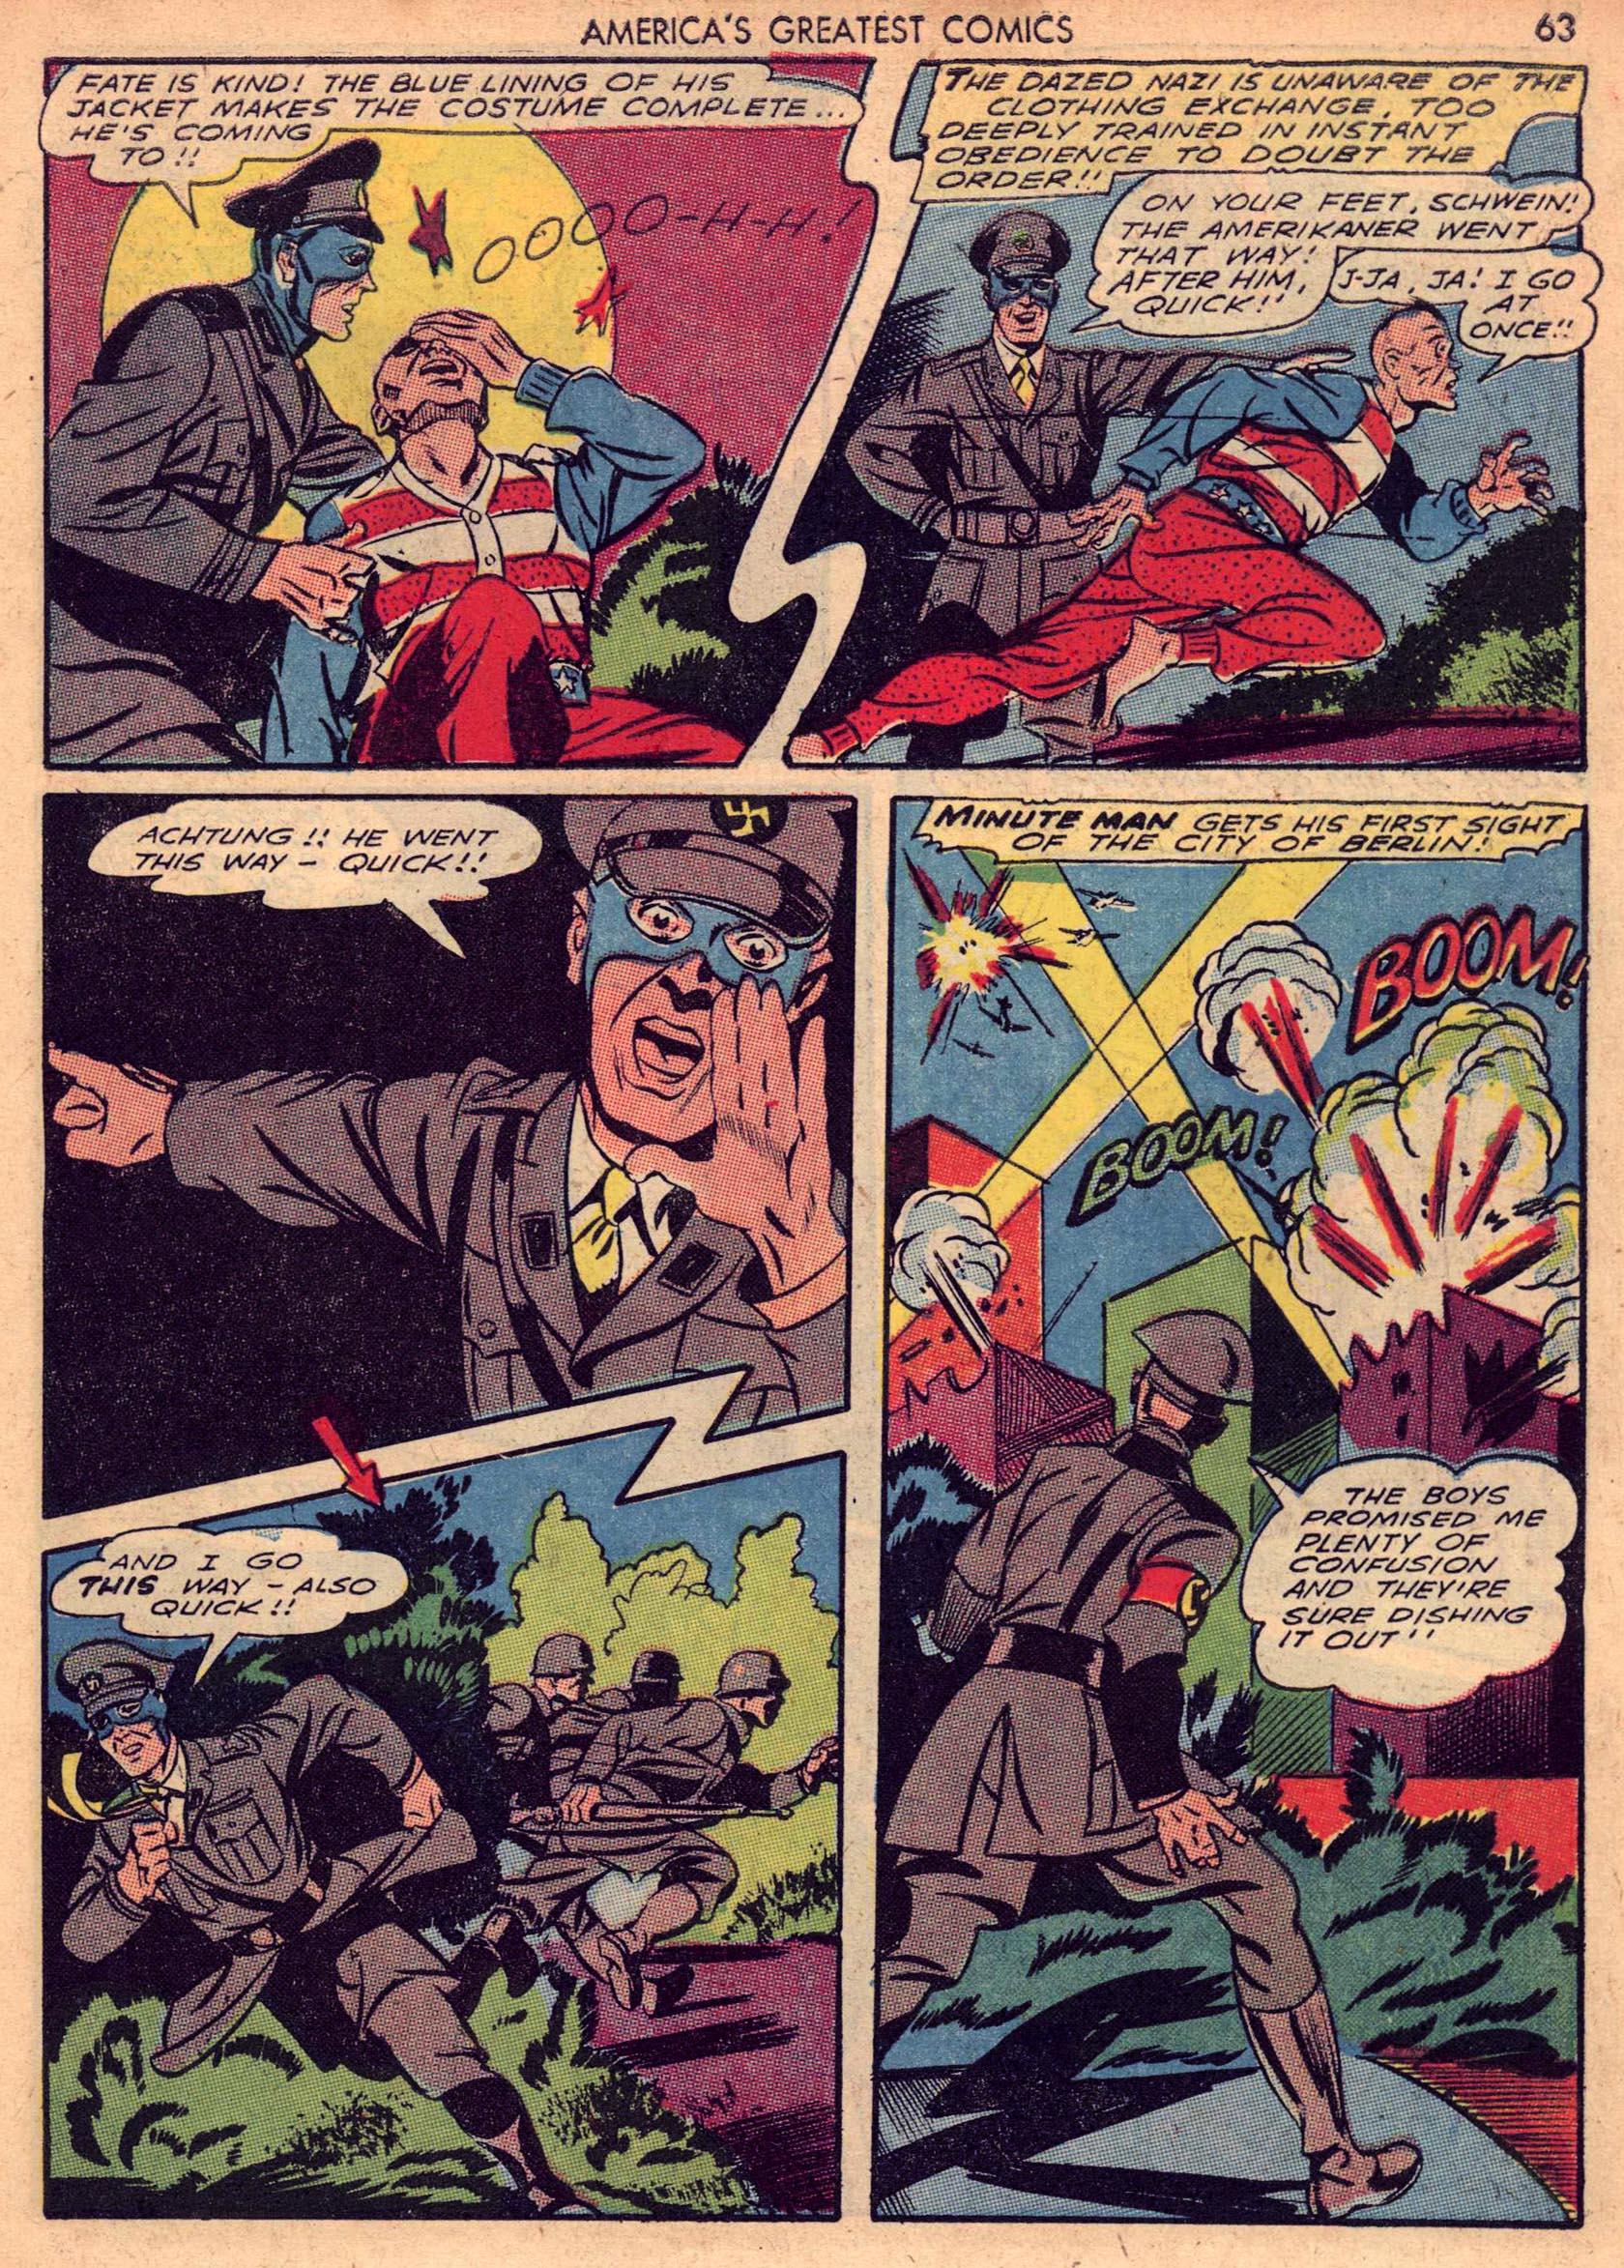 Read online America's Greatest Comics comic -  Issue #7 - 62